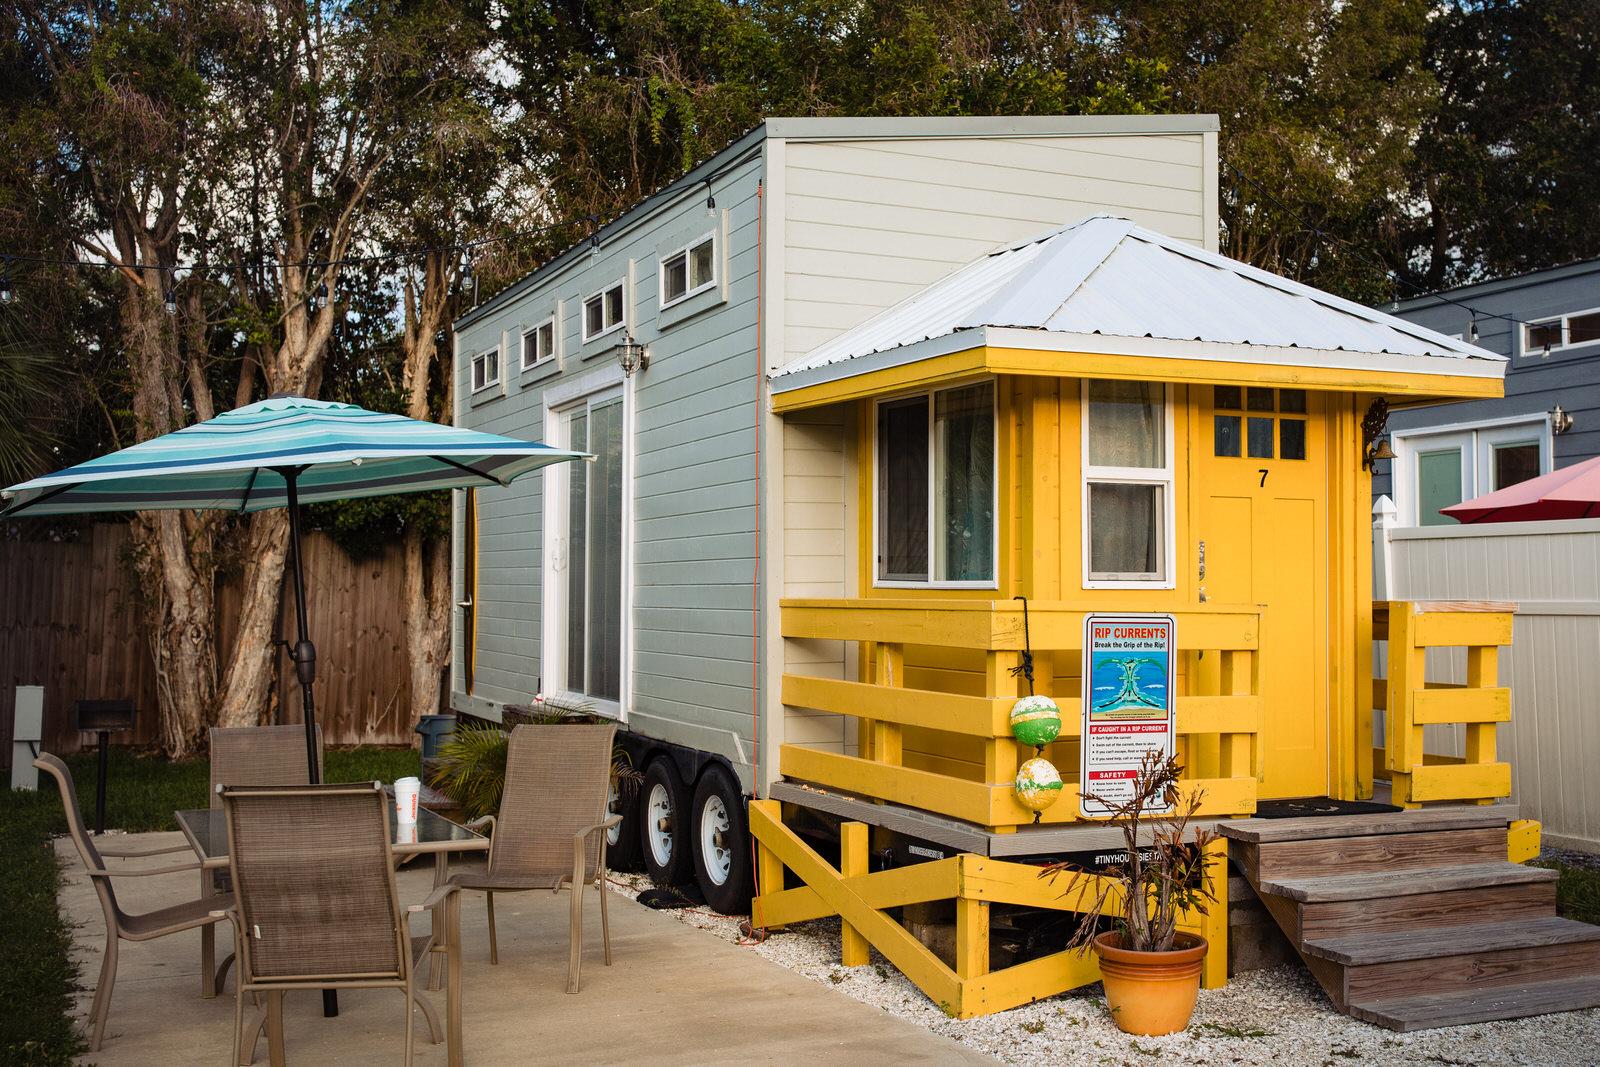 siesta-key-florida-tiny-house-photo-vacation-beach-nature-macro-1.jpg